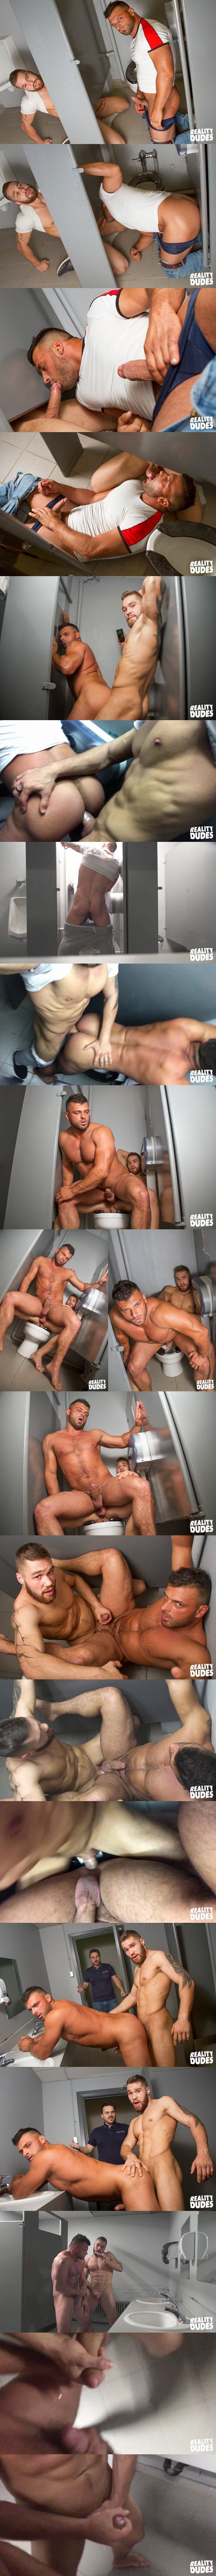 Morgan Blake fucks Jeremy in a public bathroom in Dudes In Pubilc 12 - Understall at Realitydudes 02